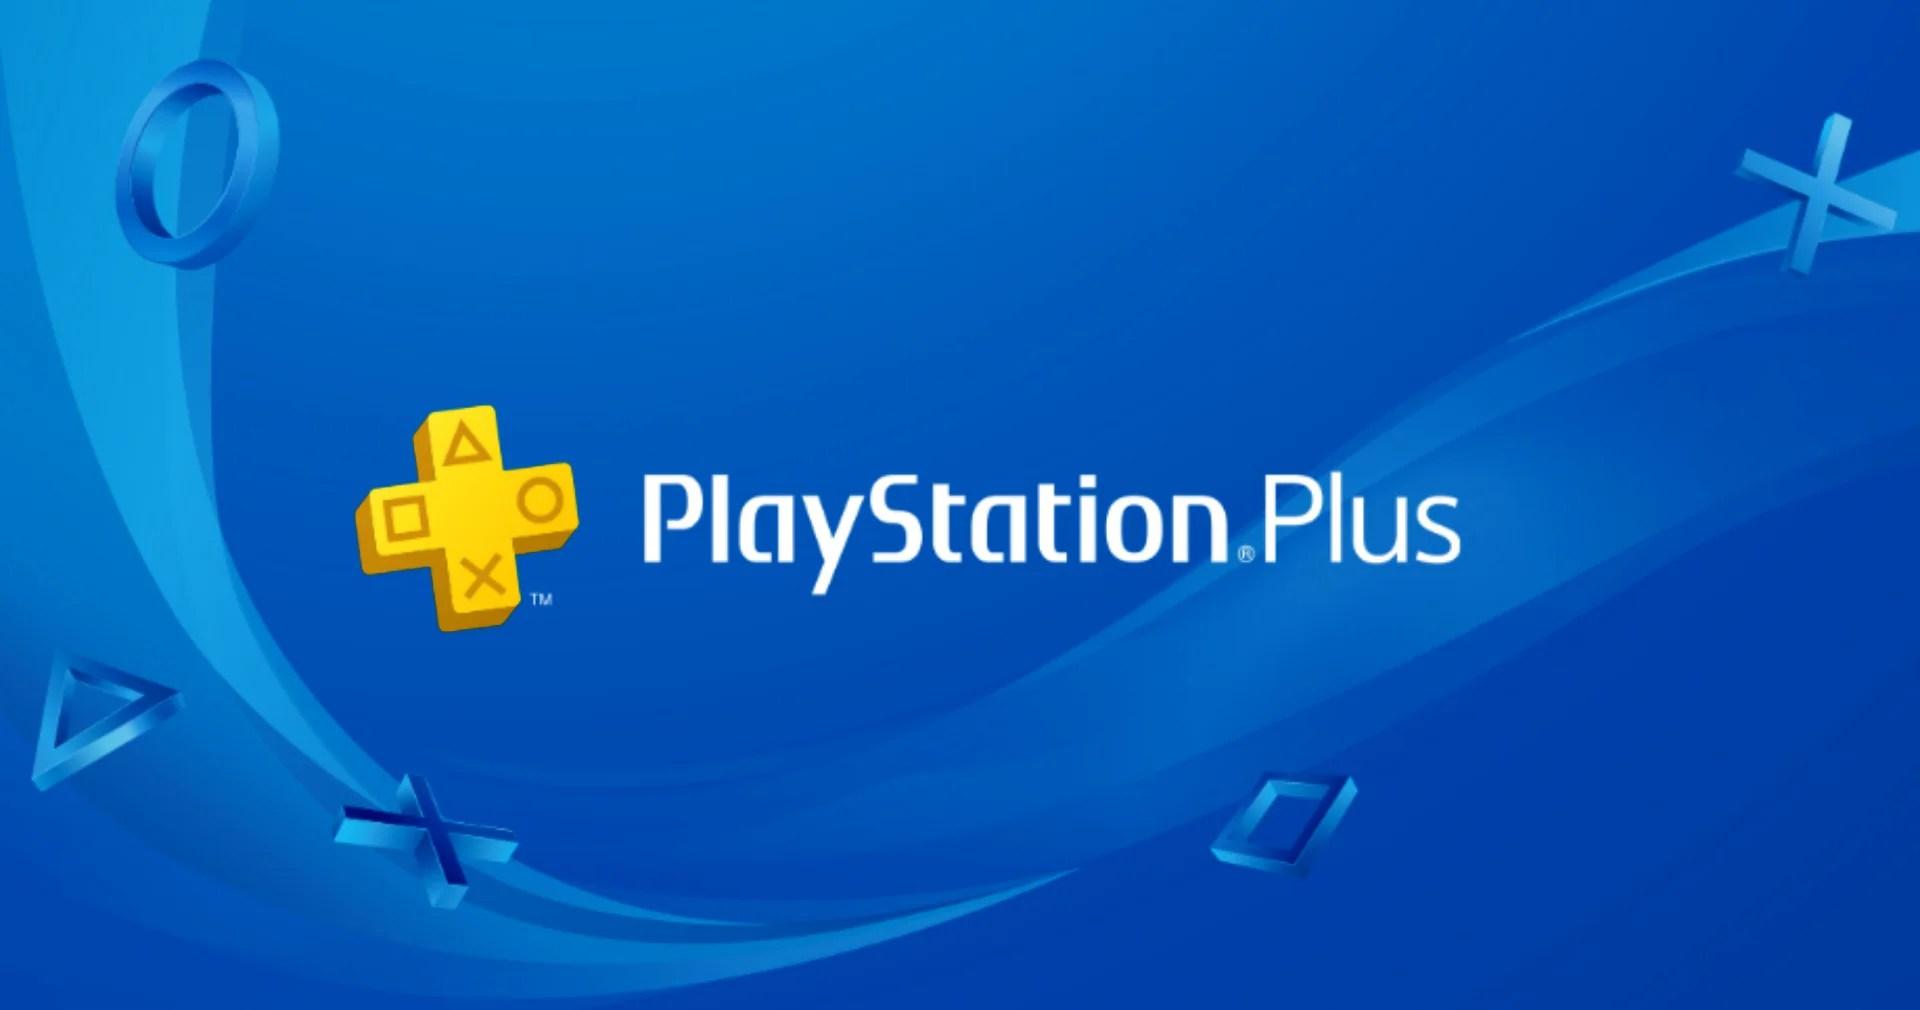 【News】PS Plusが514円から850円の新価格へ。実施は8月から